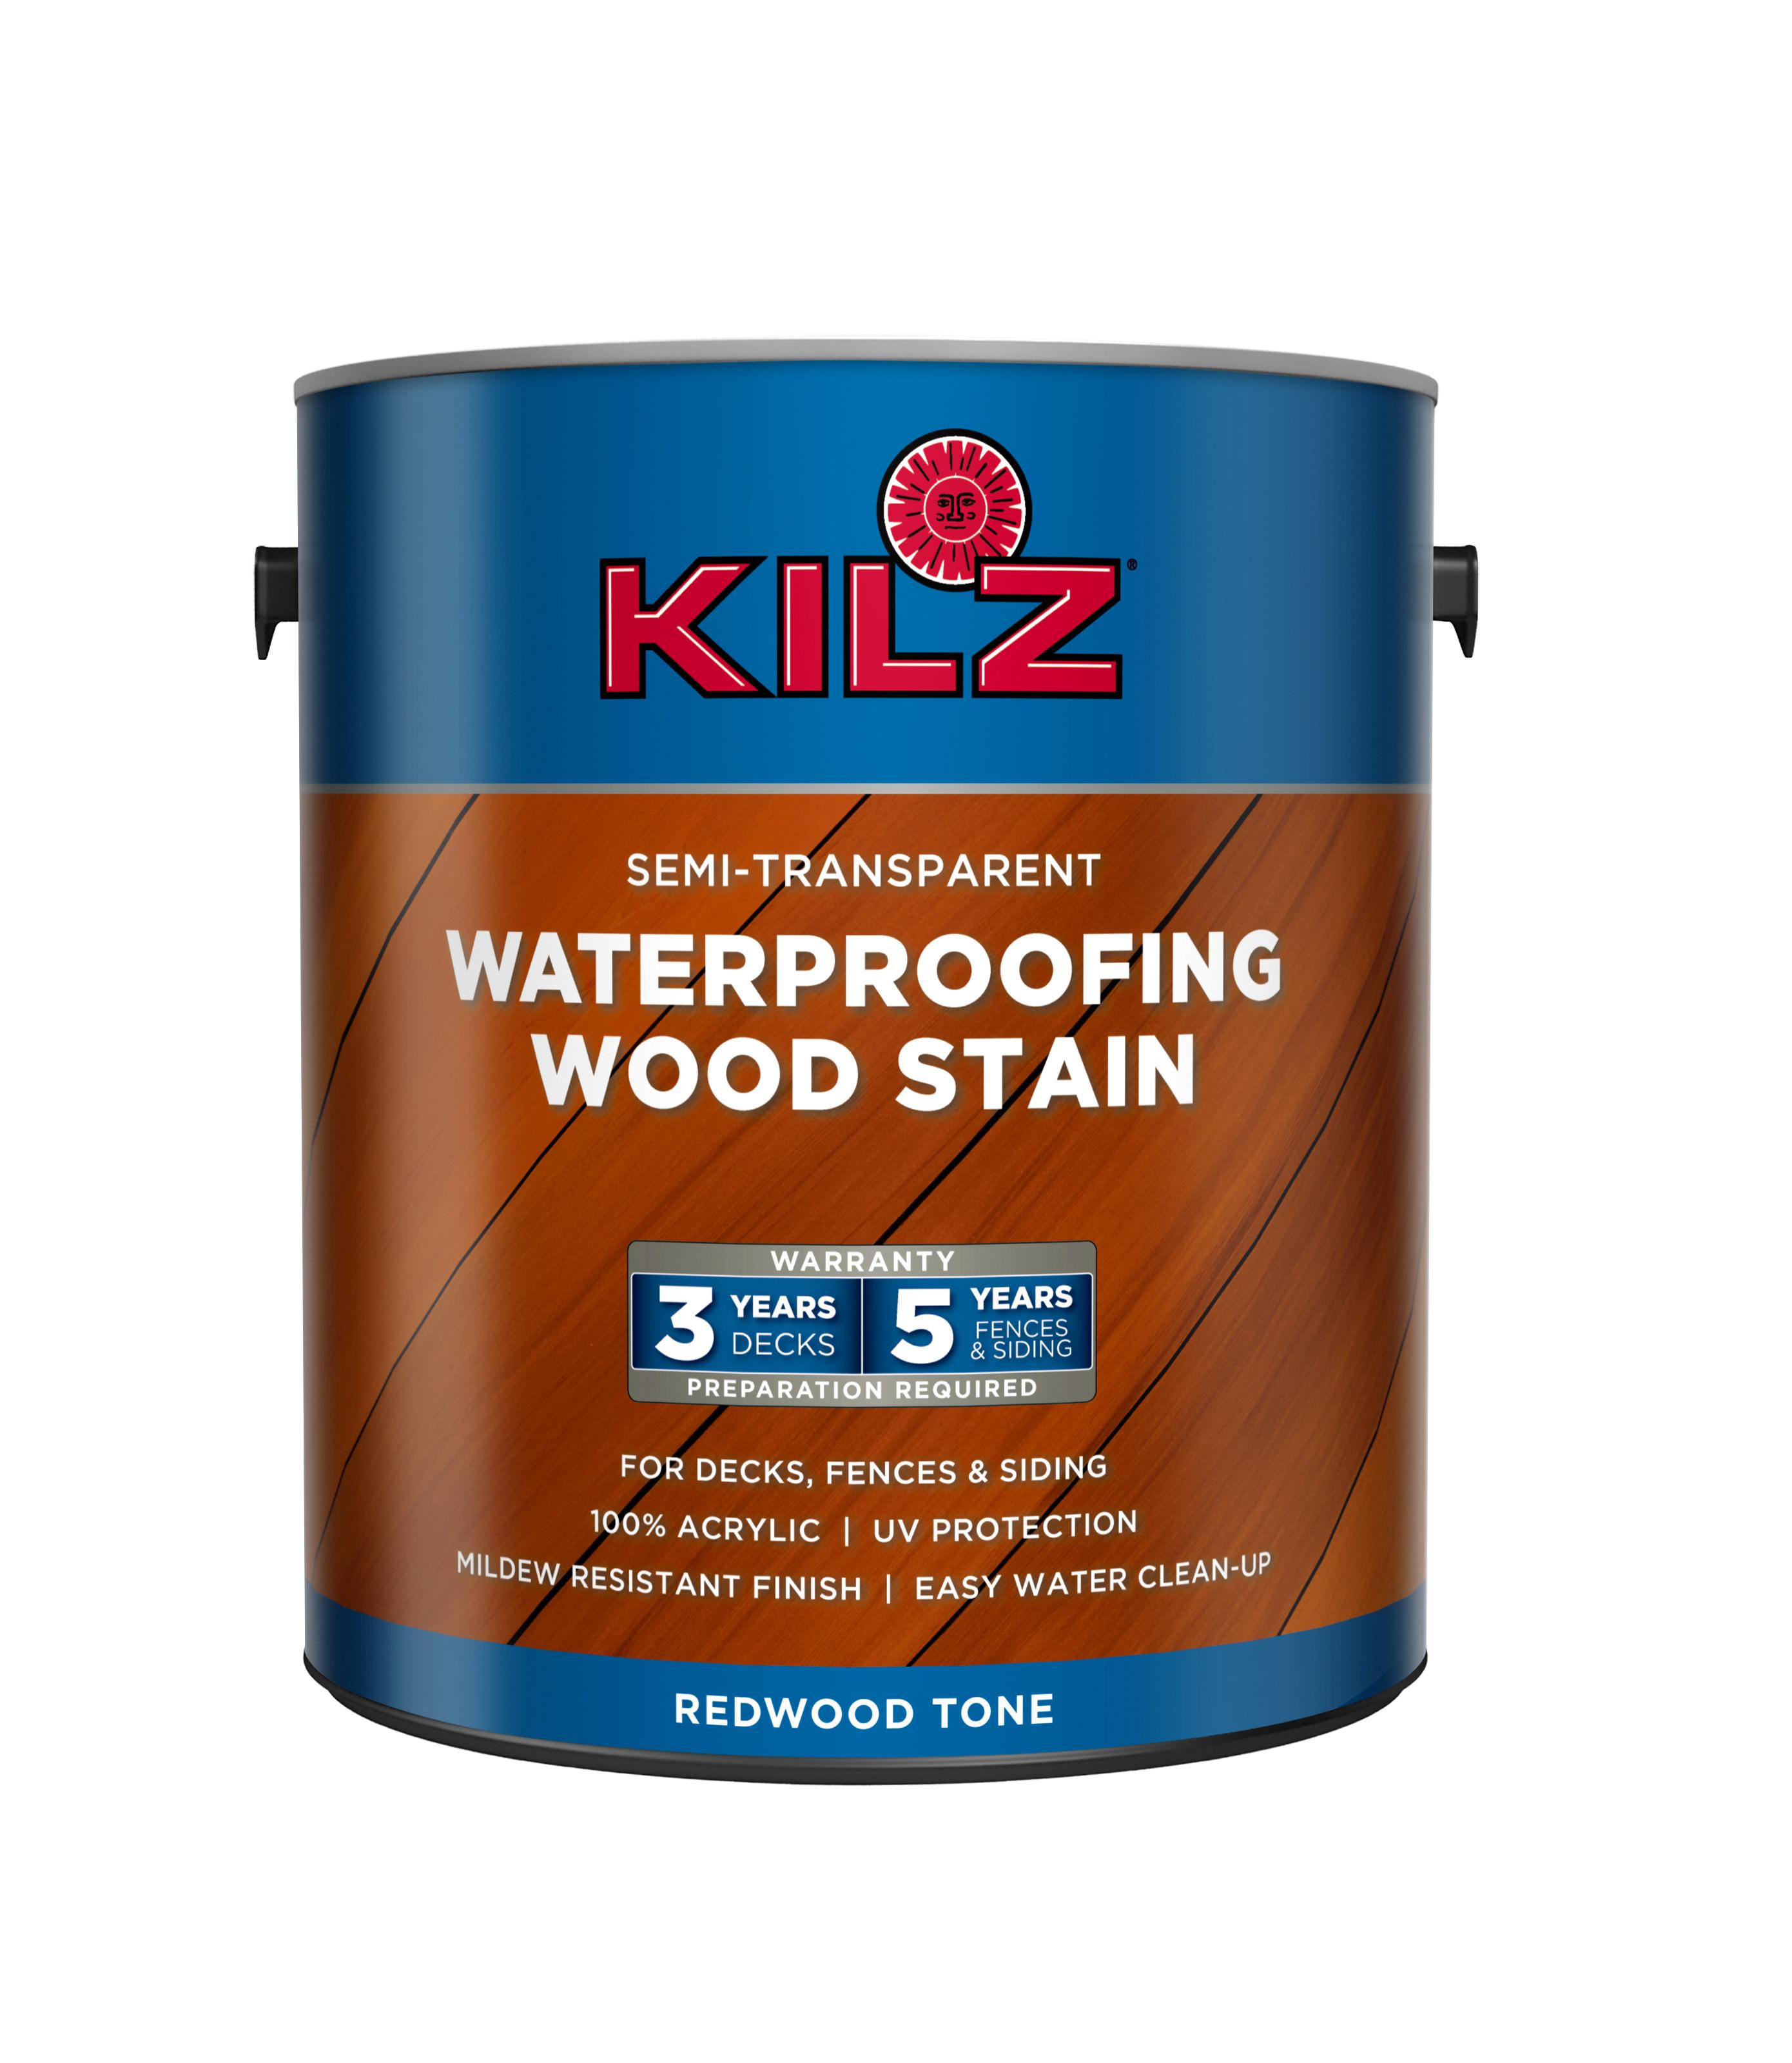 1-Gallon KILZ Exterior Waterproofing Wood Stain, Semi-Transparent, Redwood $15 + FS w/ Prime